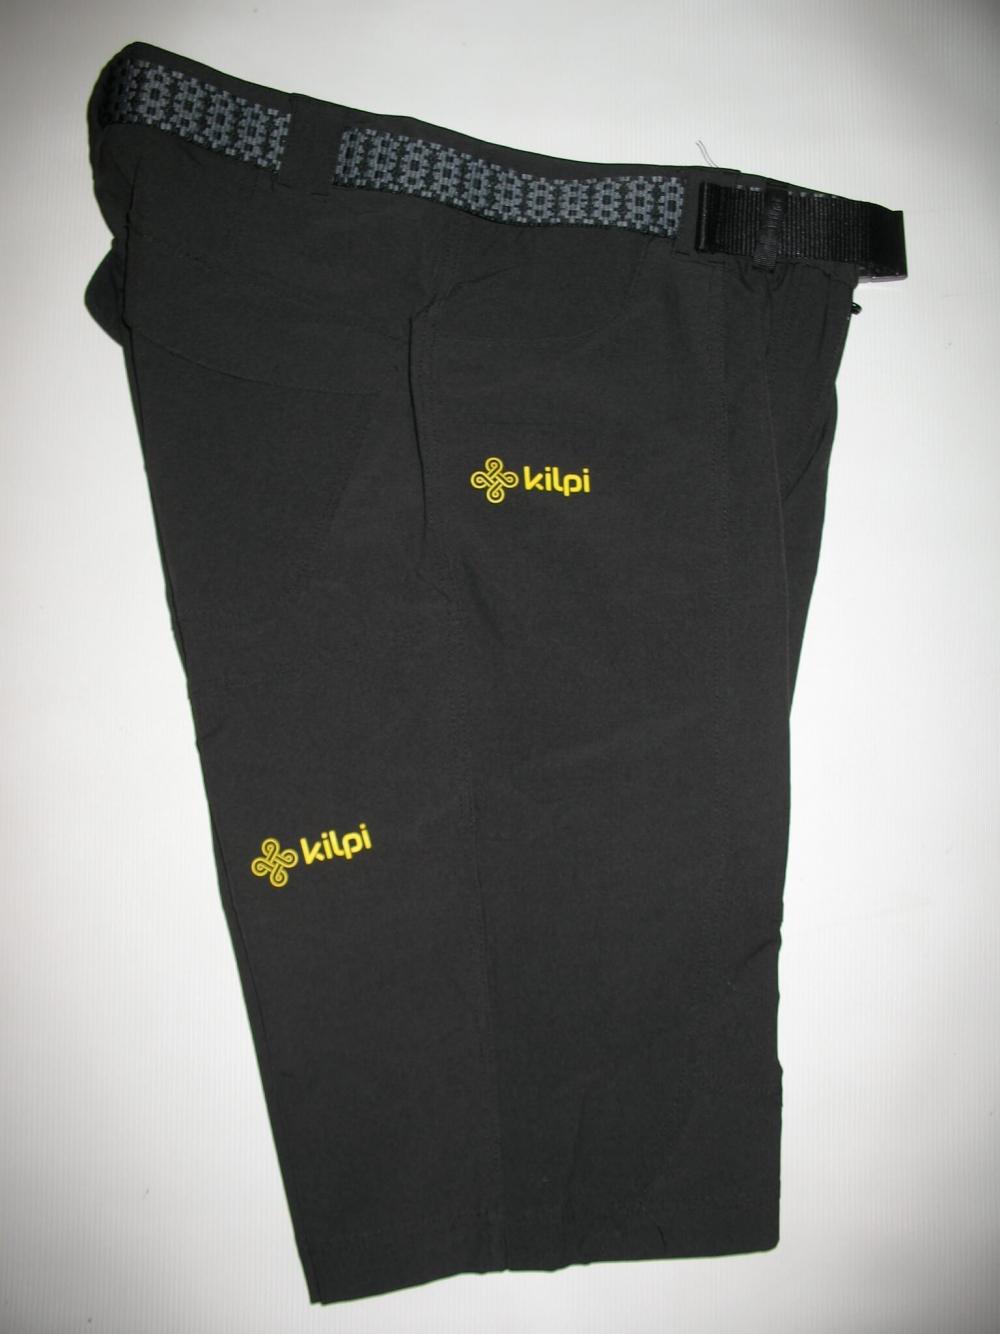 Шорты KILPI siberium src sb shorts lady (размер 36/S) - 4